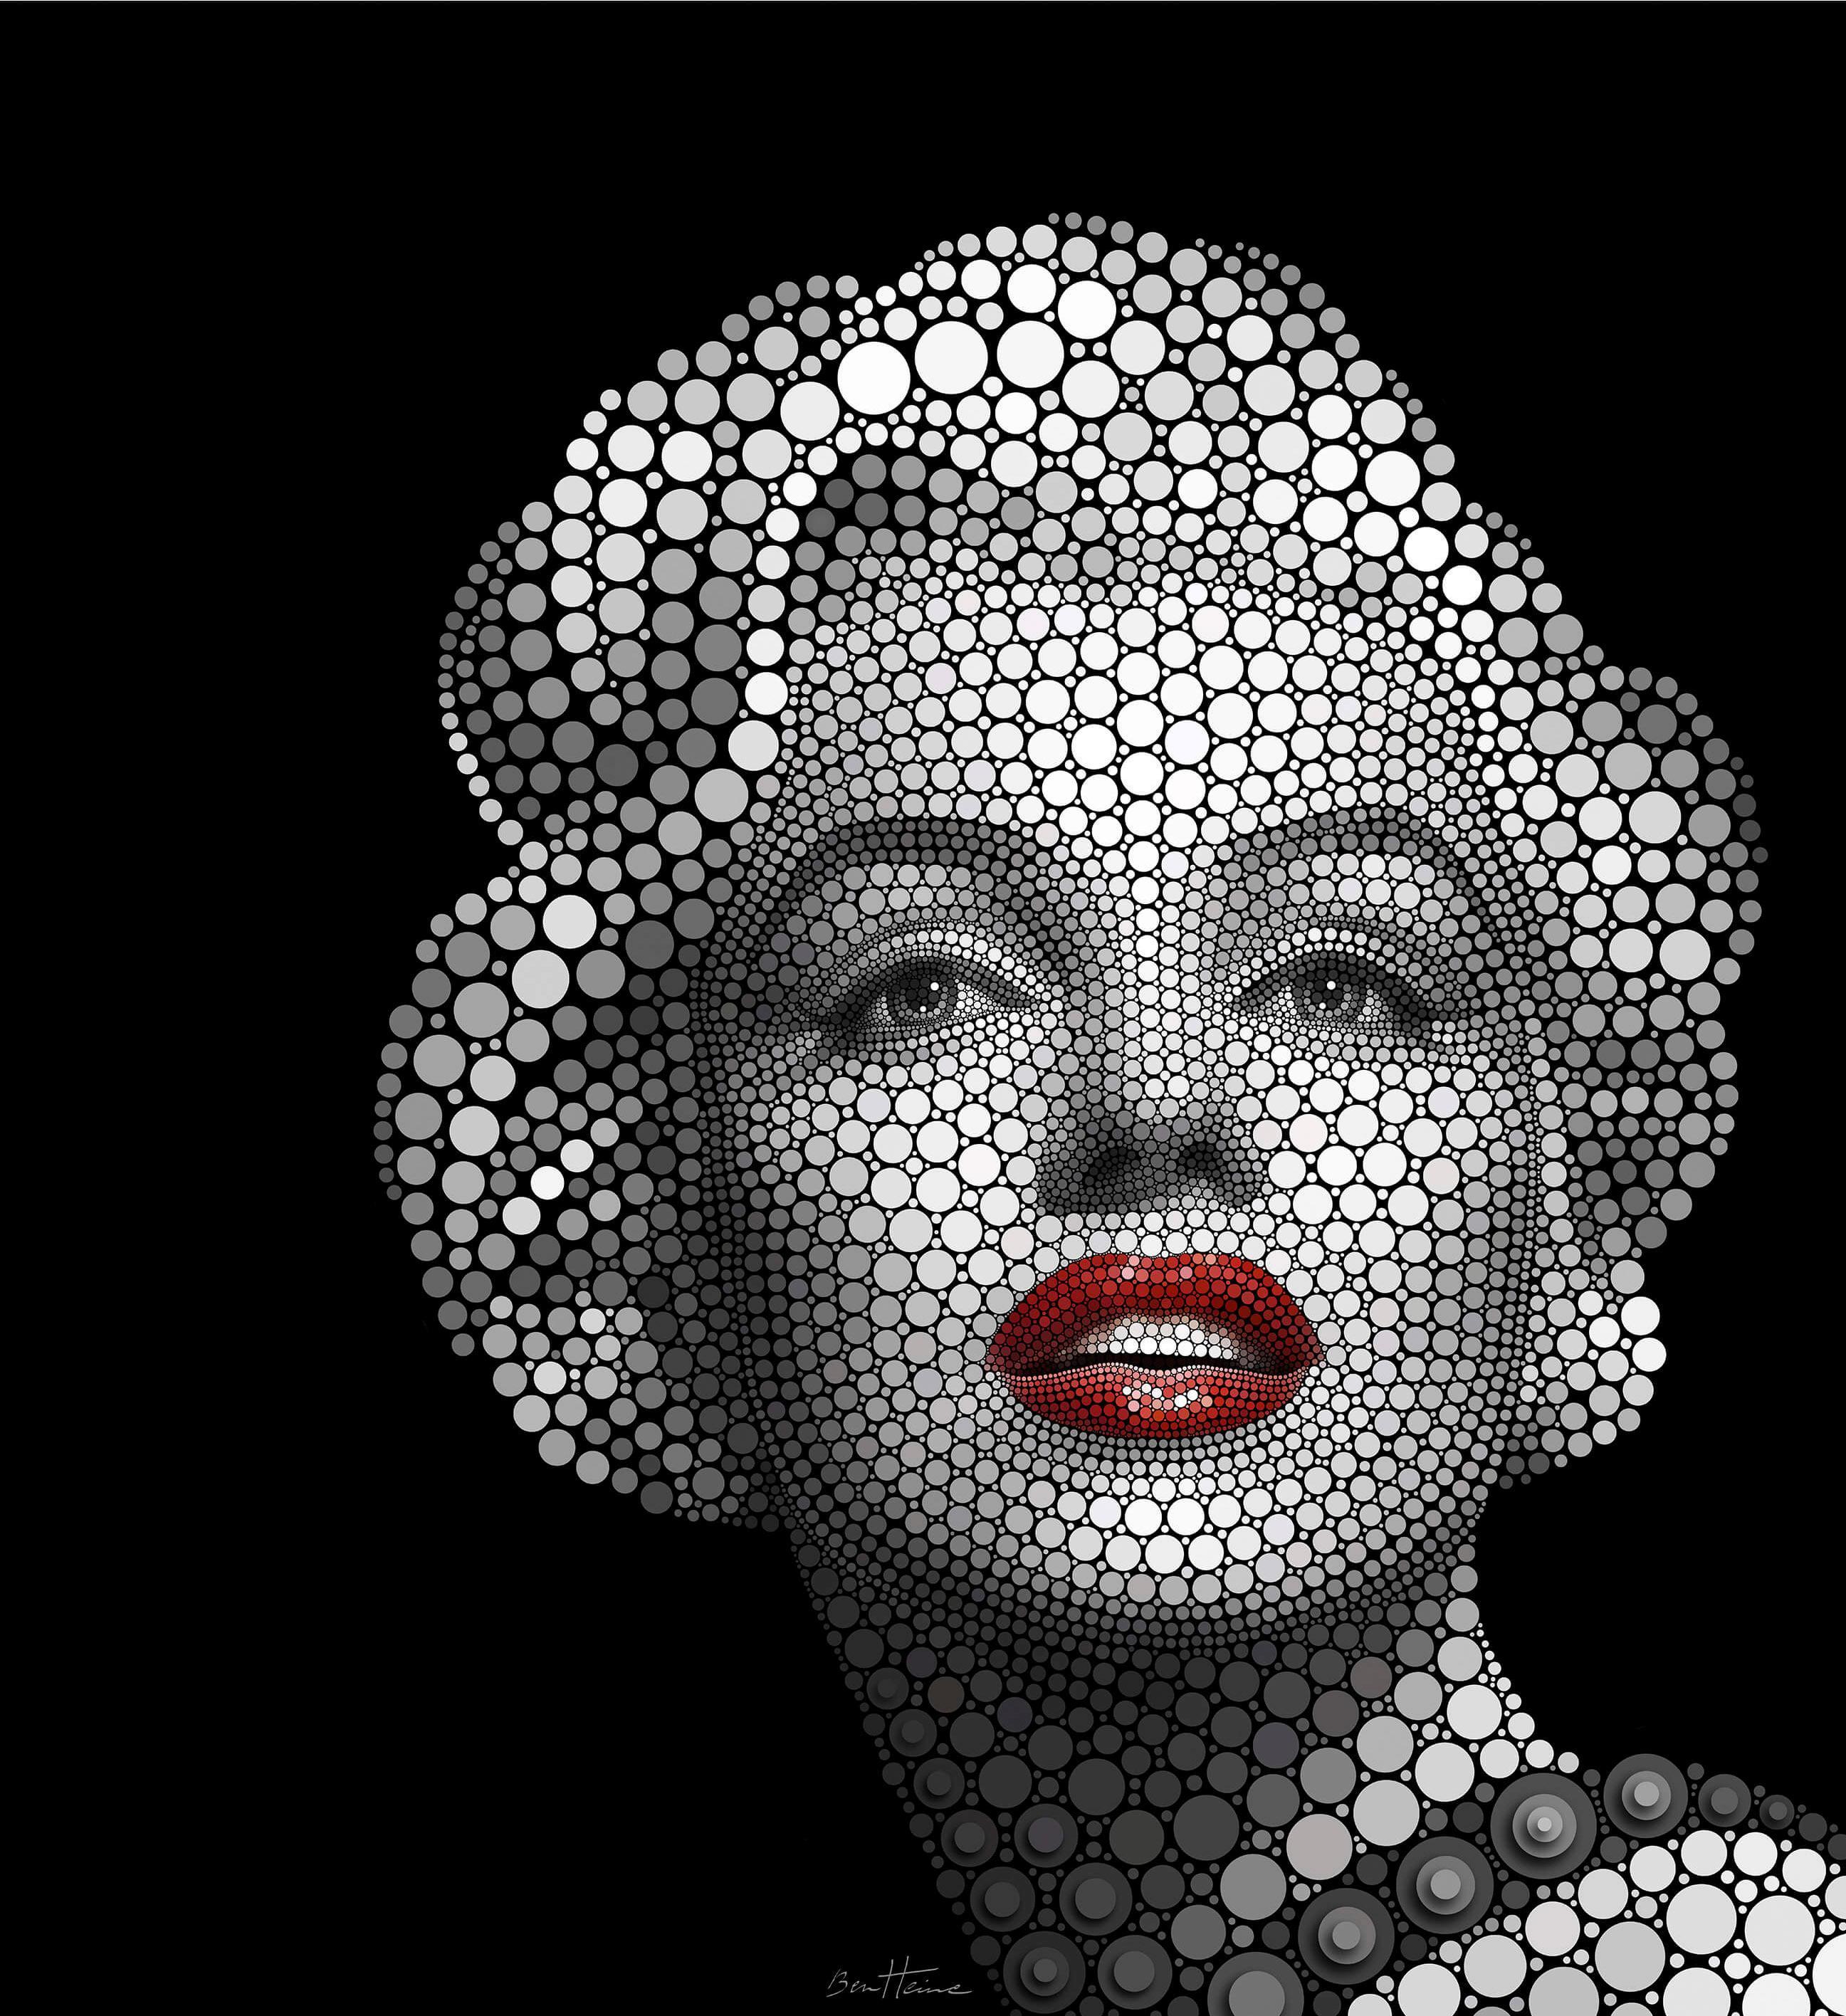 Vliestapete Ben Heine Circlism: Marilyn Monroe Wohnen/Wohntextilien/Tapeten/Fototapeten/Fototapeten Kunst